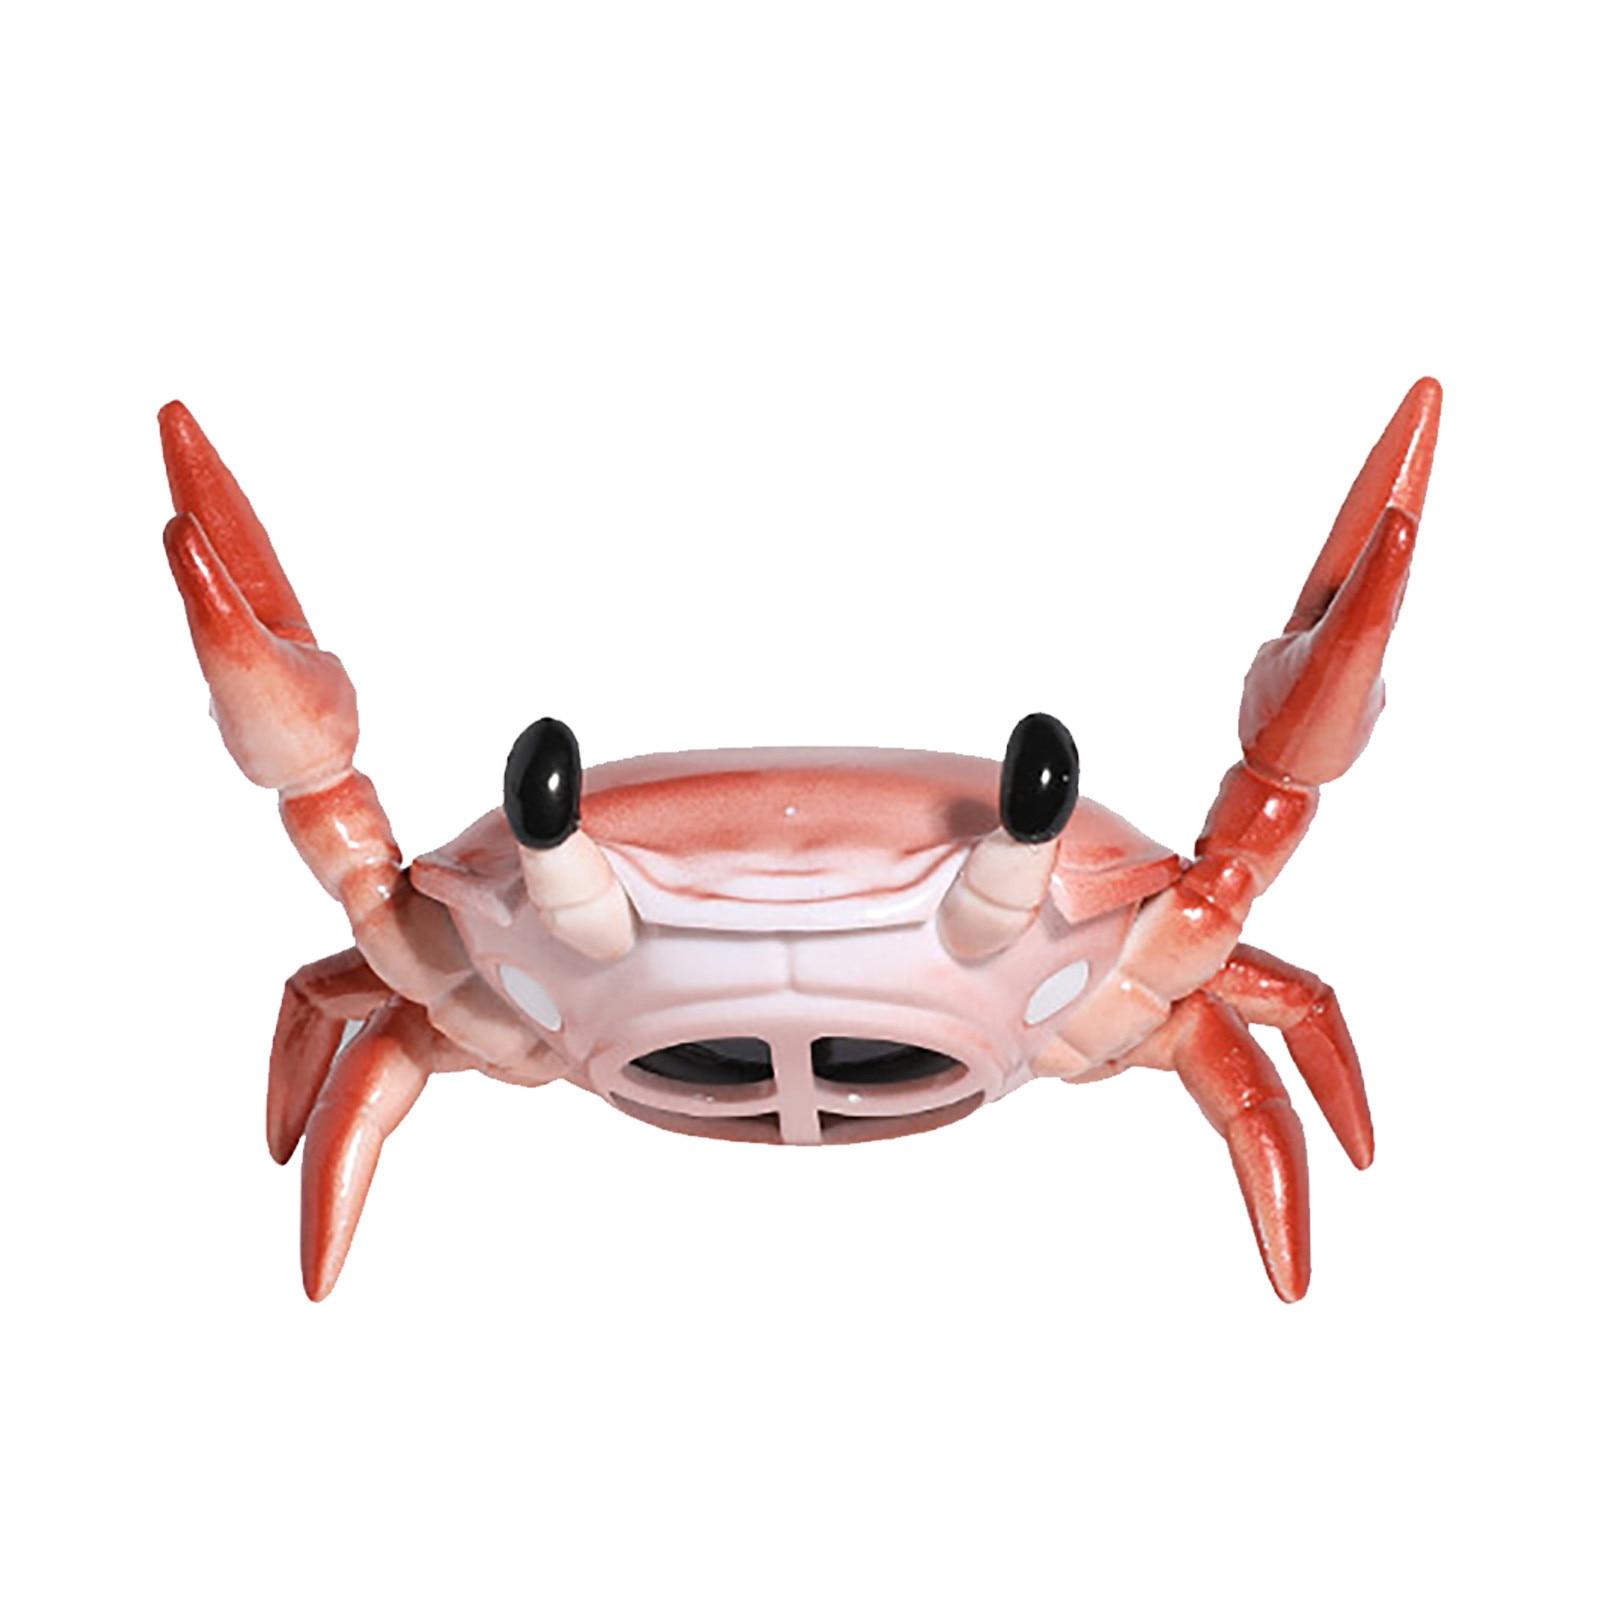 New Creative Crab Shape Wireless Bluetooth Mini Speaker Phone Holder Portable Surround Sound Button Creative Audio Electronics enlarge